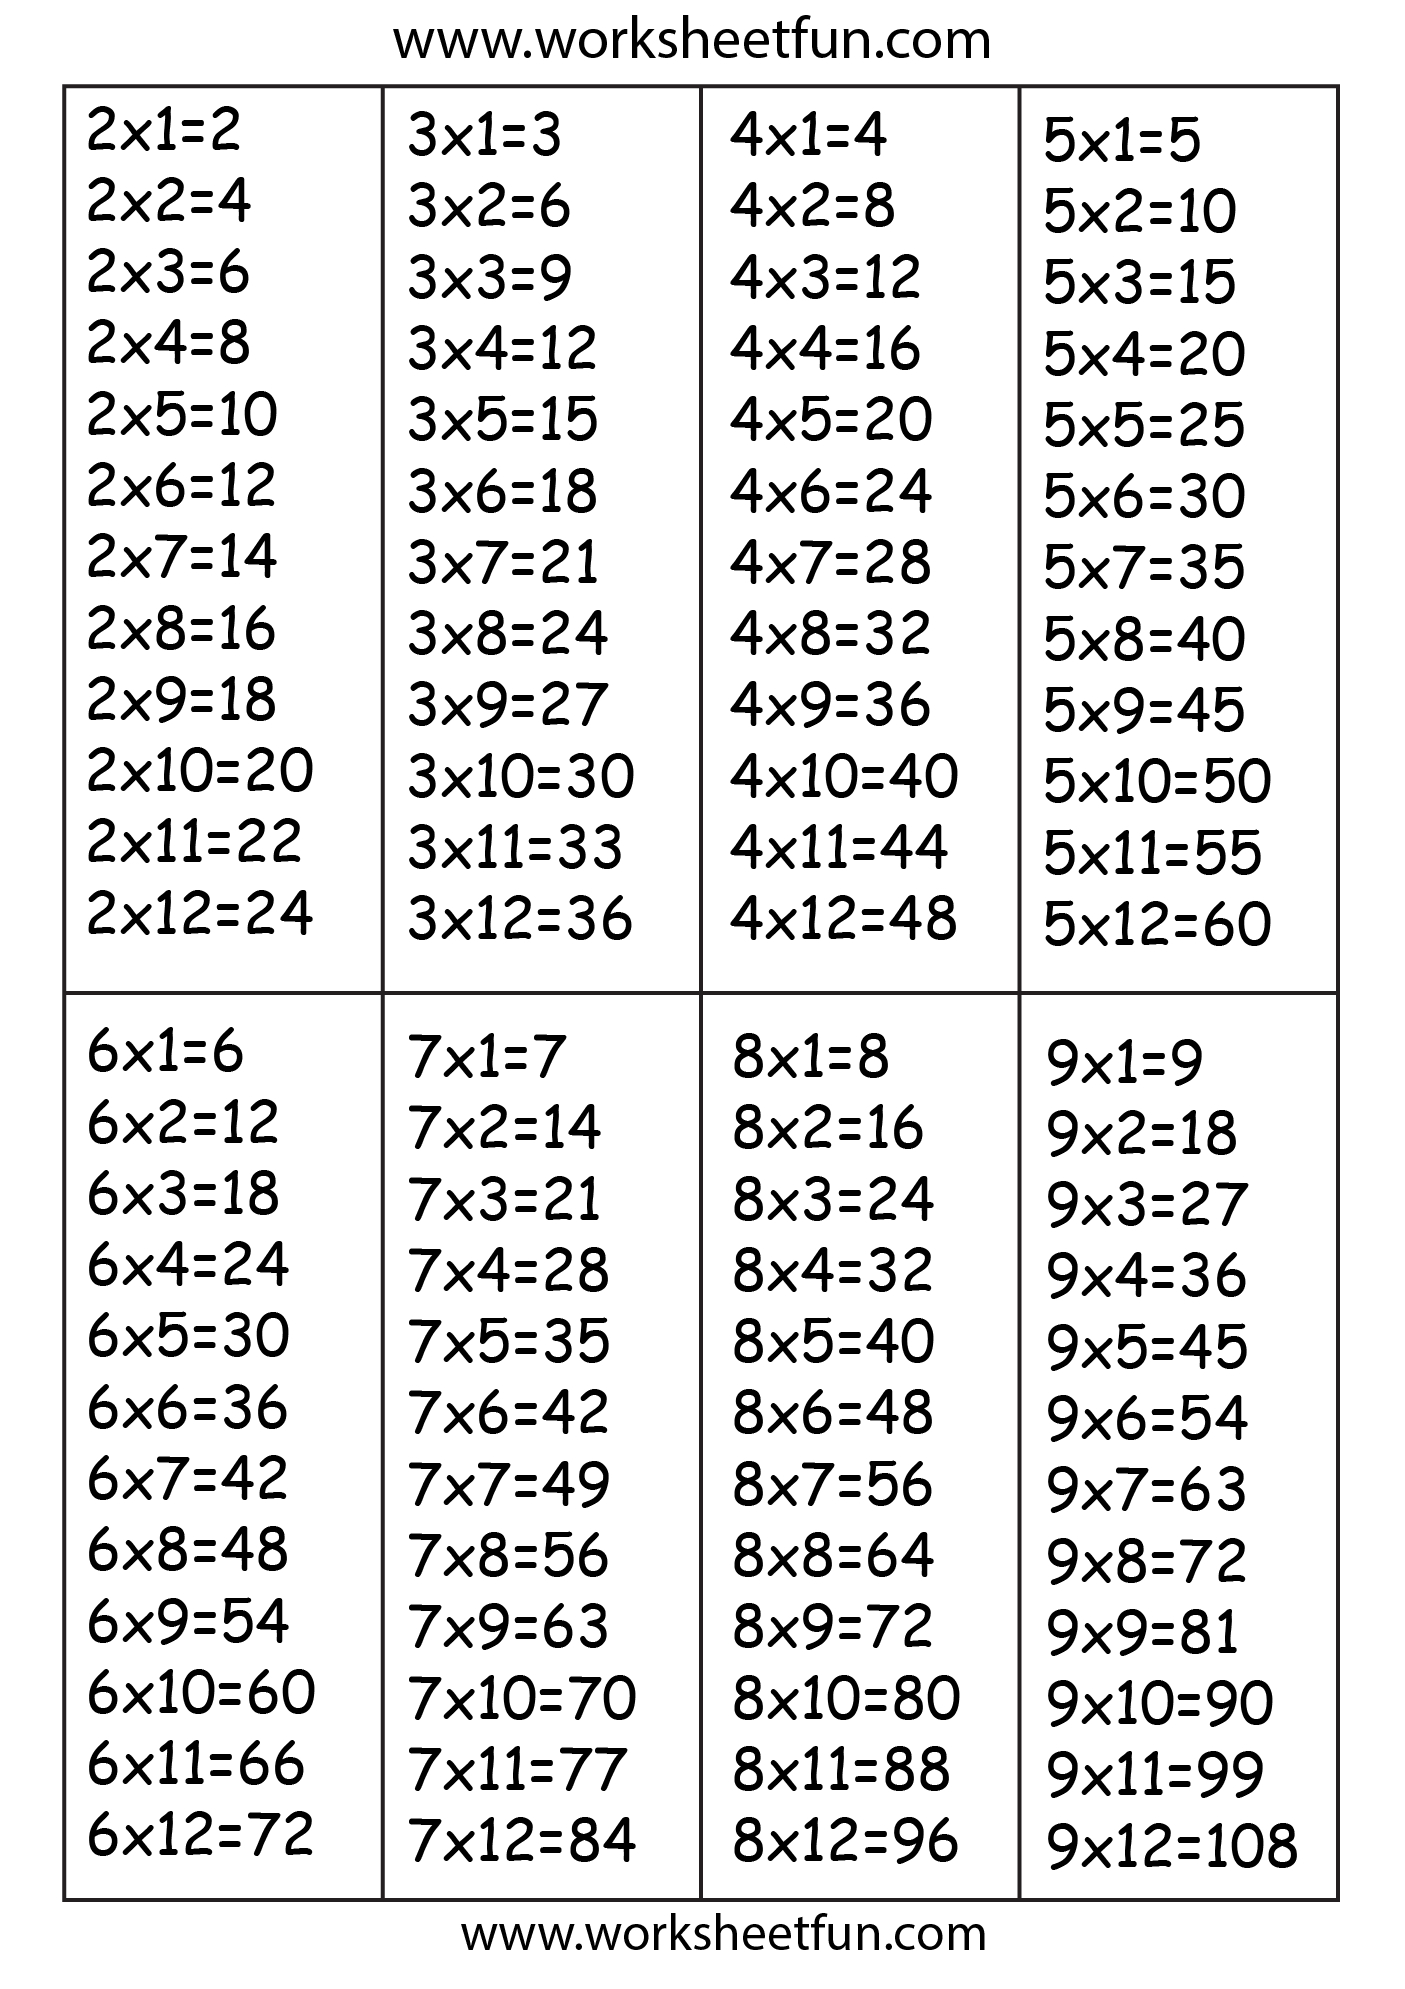 Times Table – 2 Times Table / Free Printable Worksheets – Worksheetfun | Multiplication Table Worksheets Printable